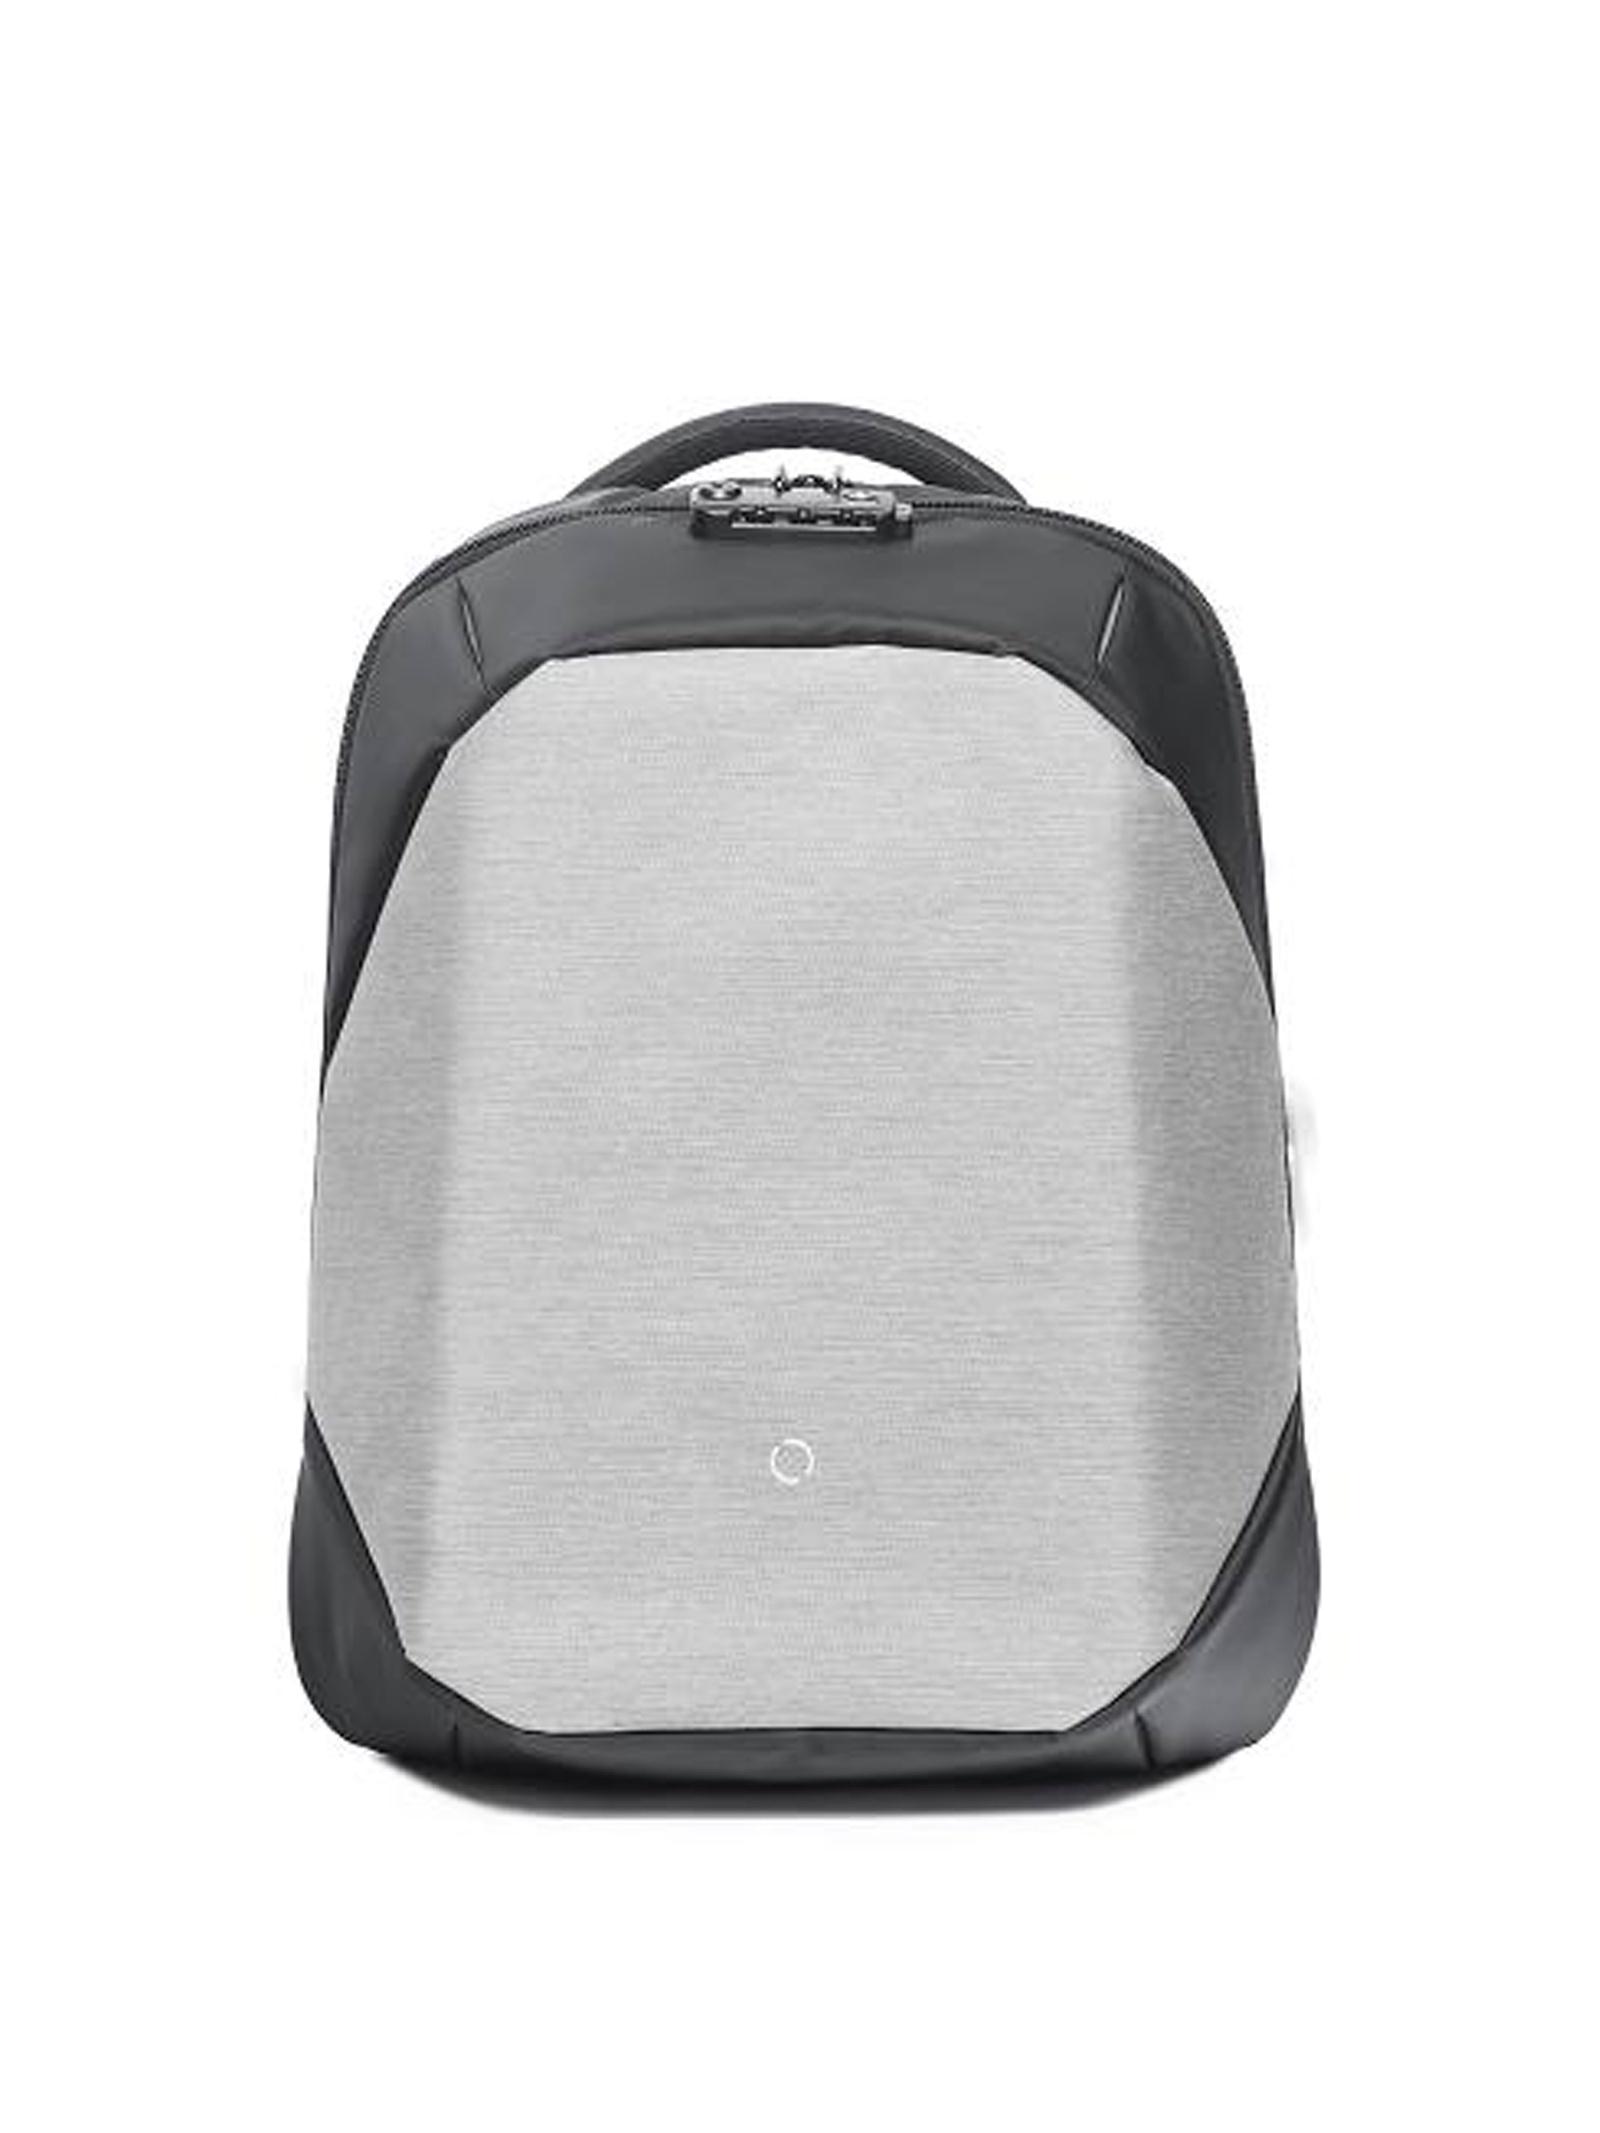 Рюкзак KORIN ClickPack Comfort, серый рюкзак korin design clickpack gray серый